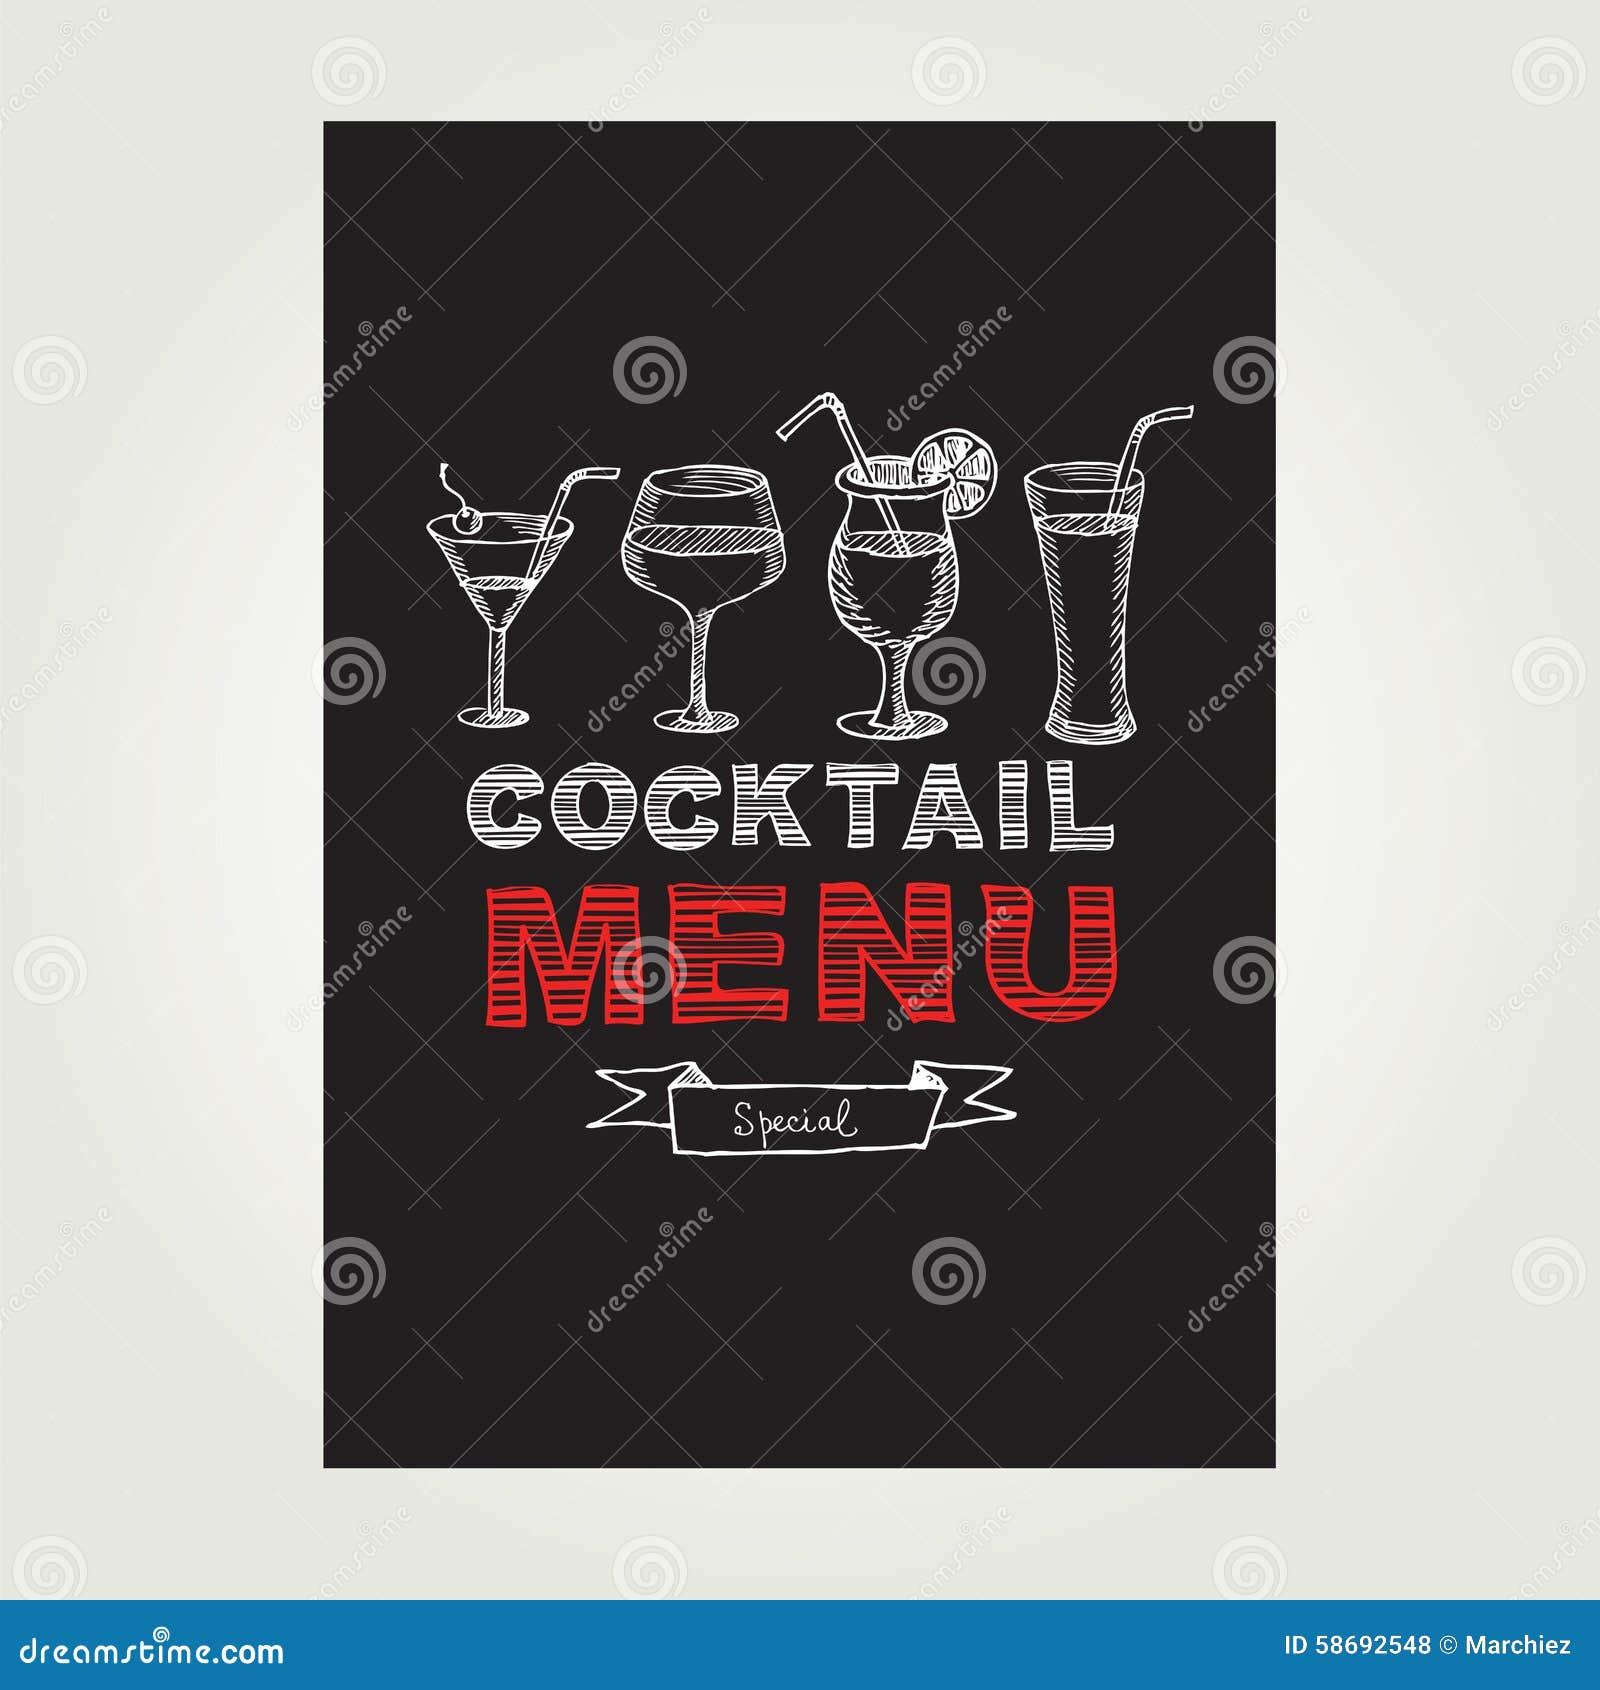 Cocktail Menu Design Free